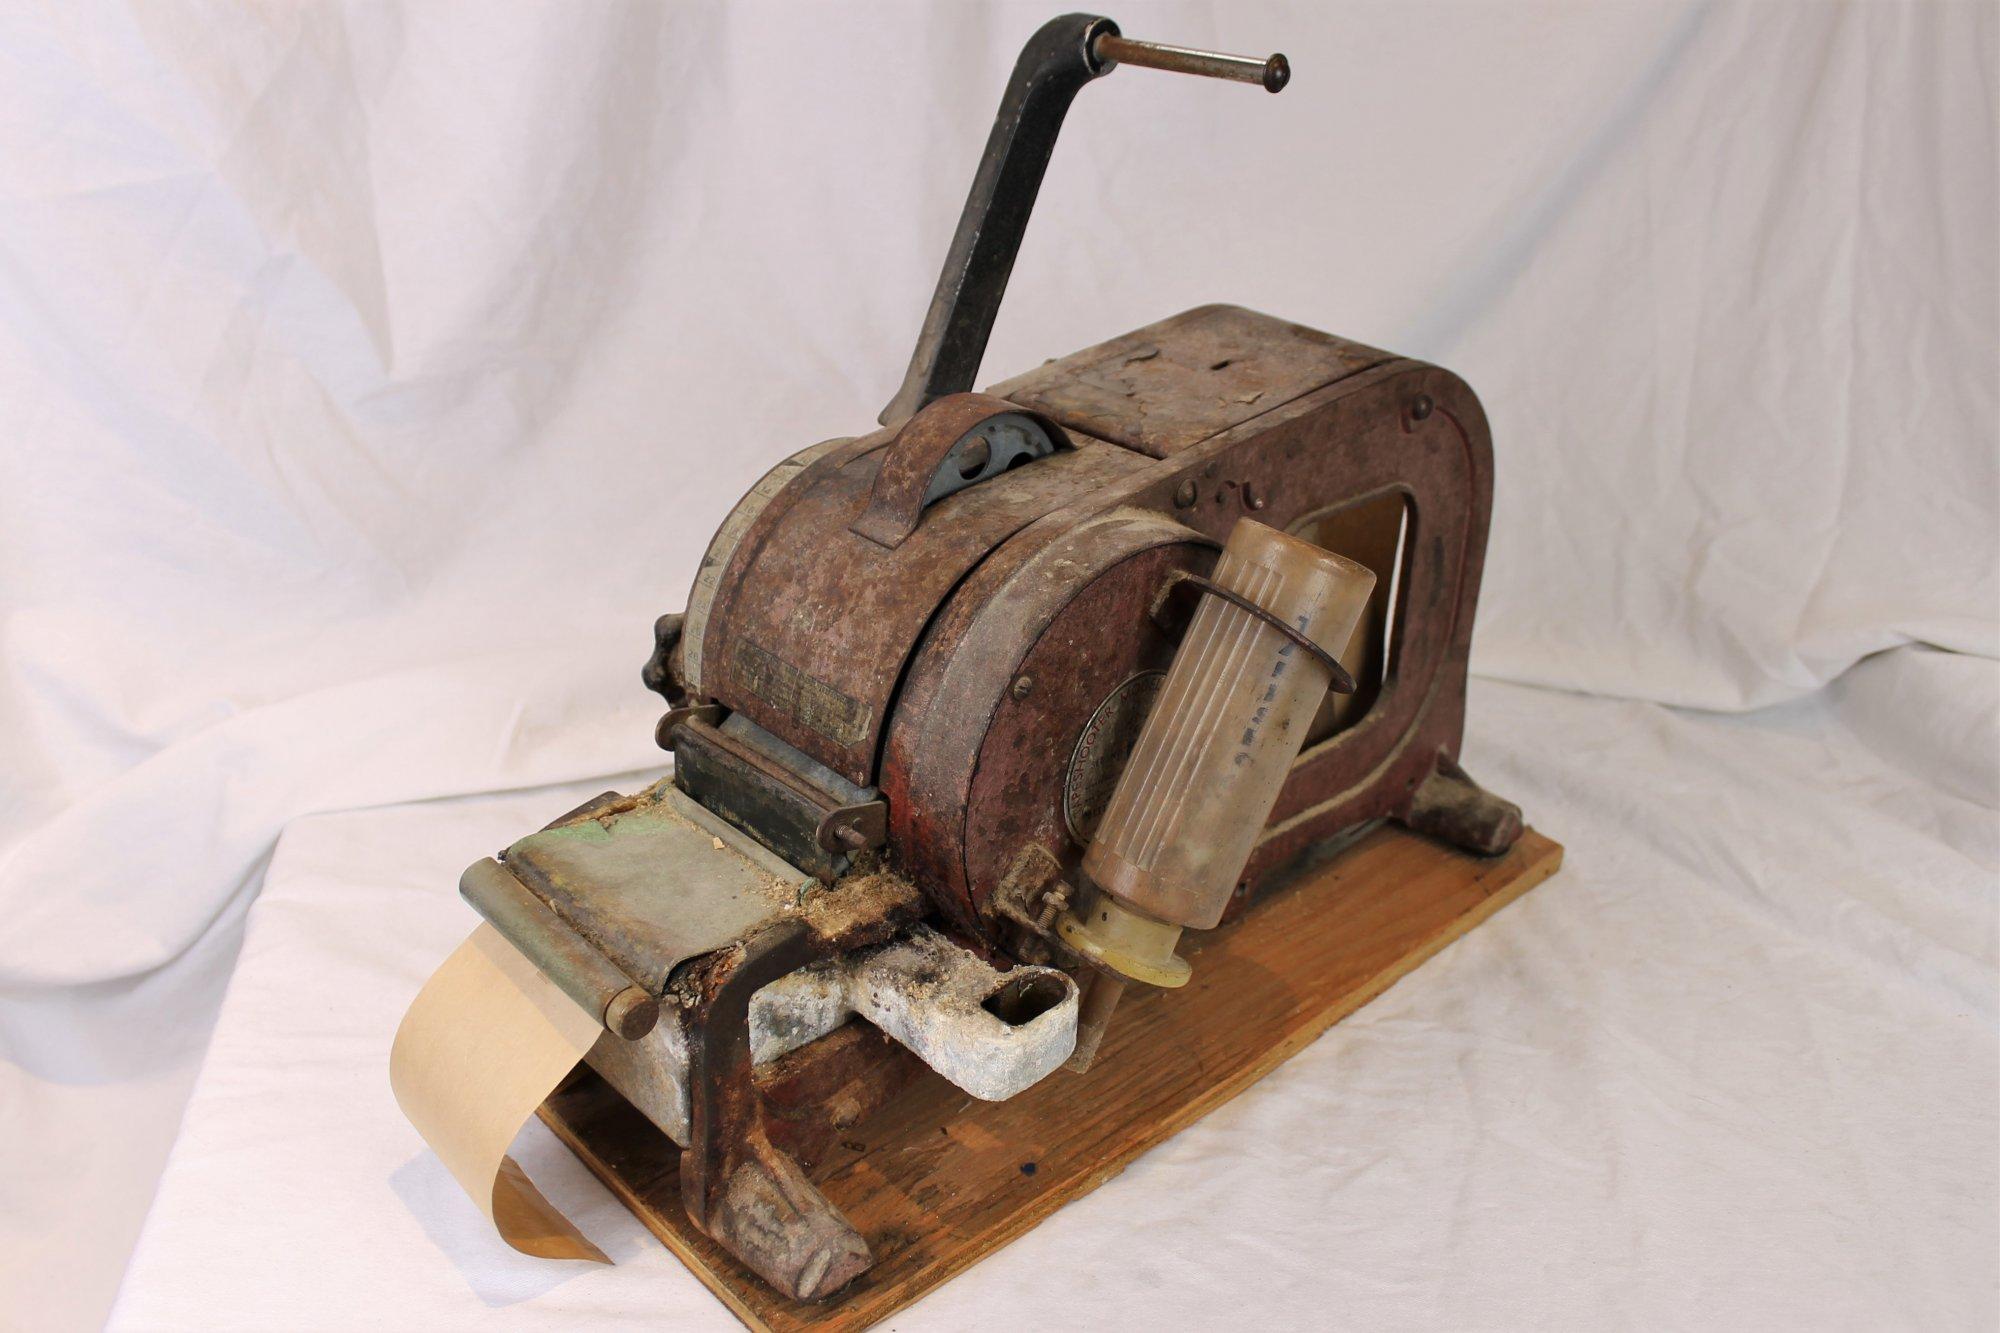 Better Packages Inc. Tapeshooter Model 100 Vintage Packing Tape Dispenser